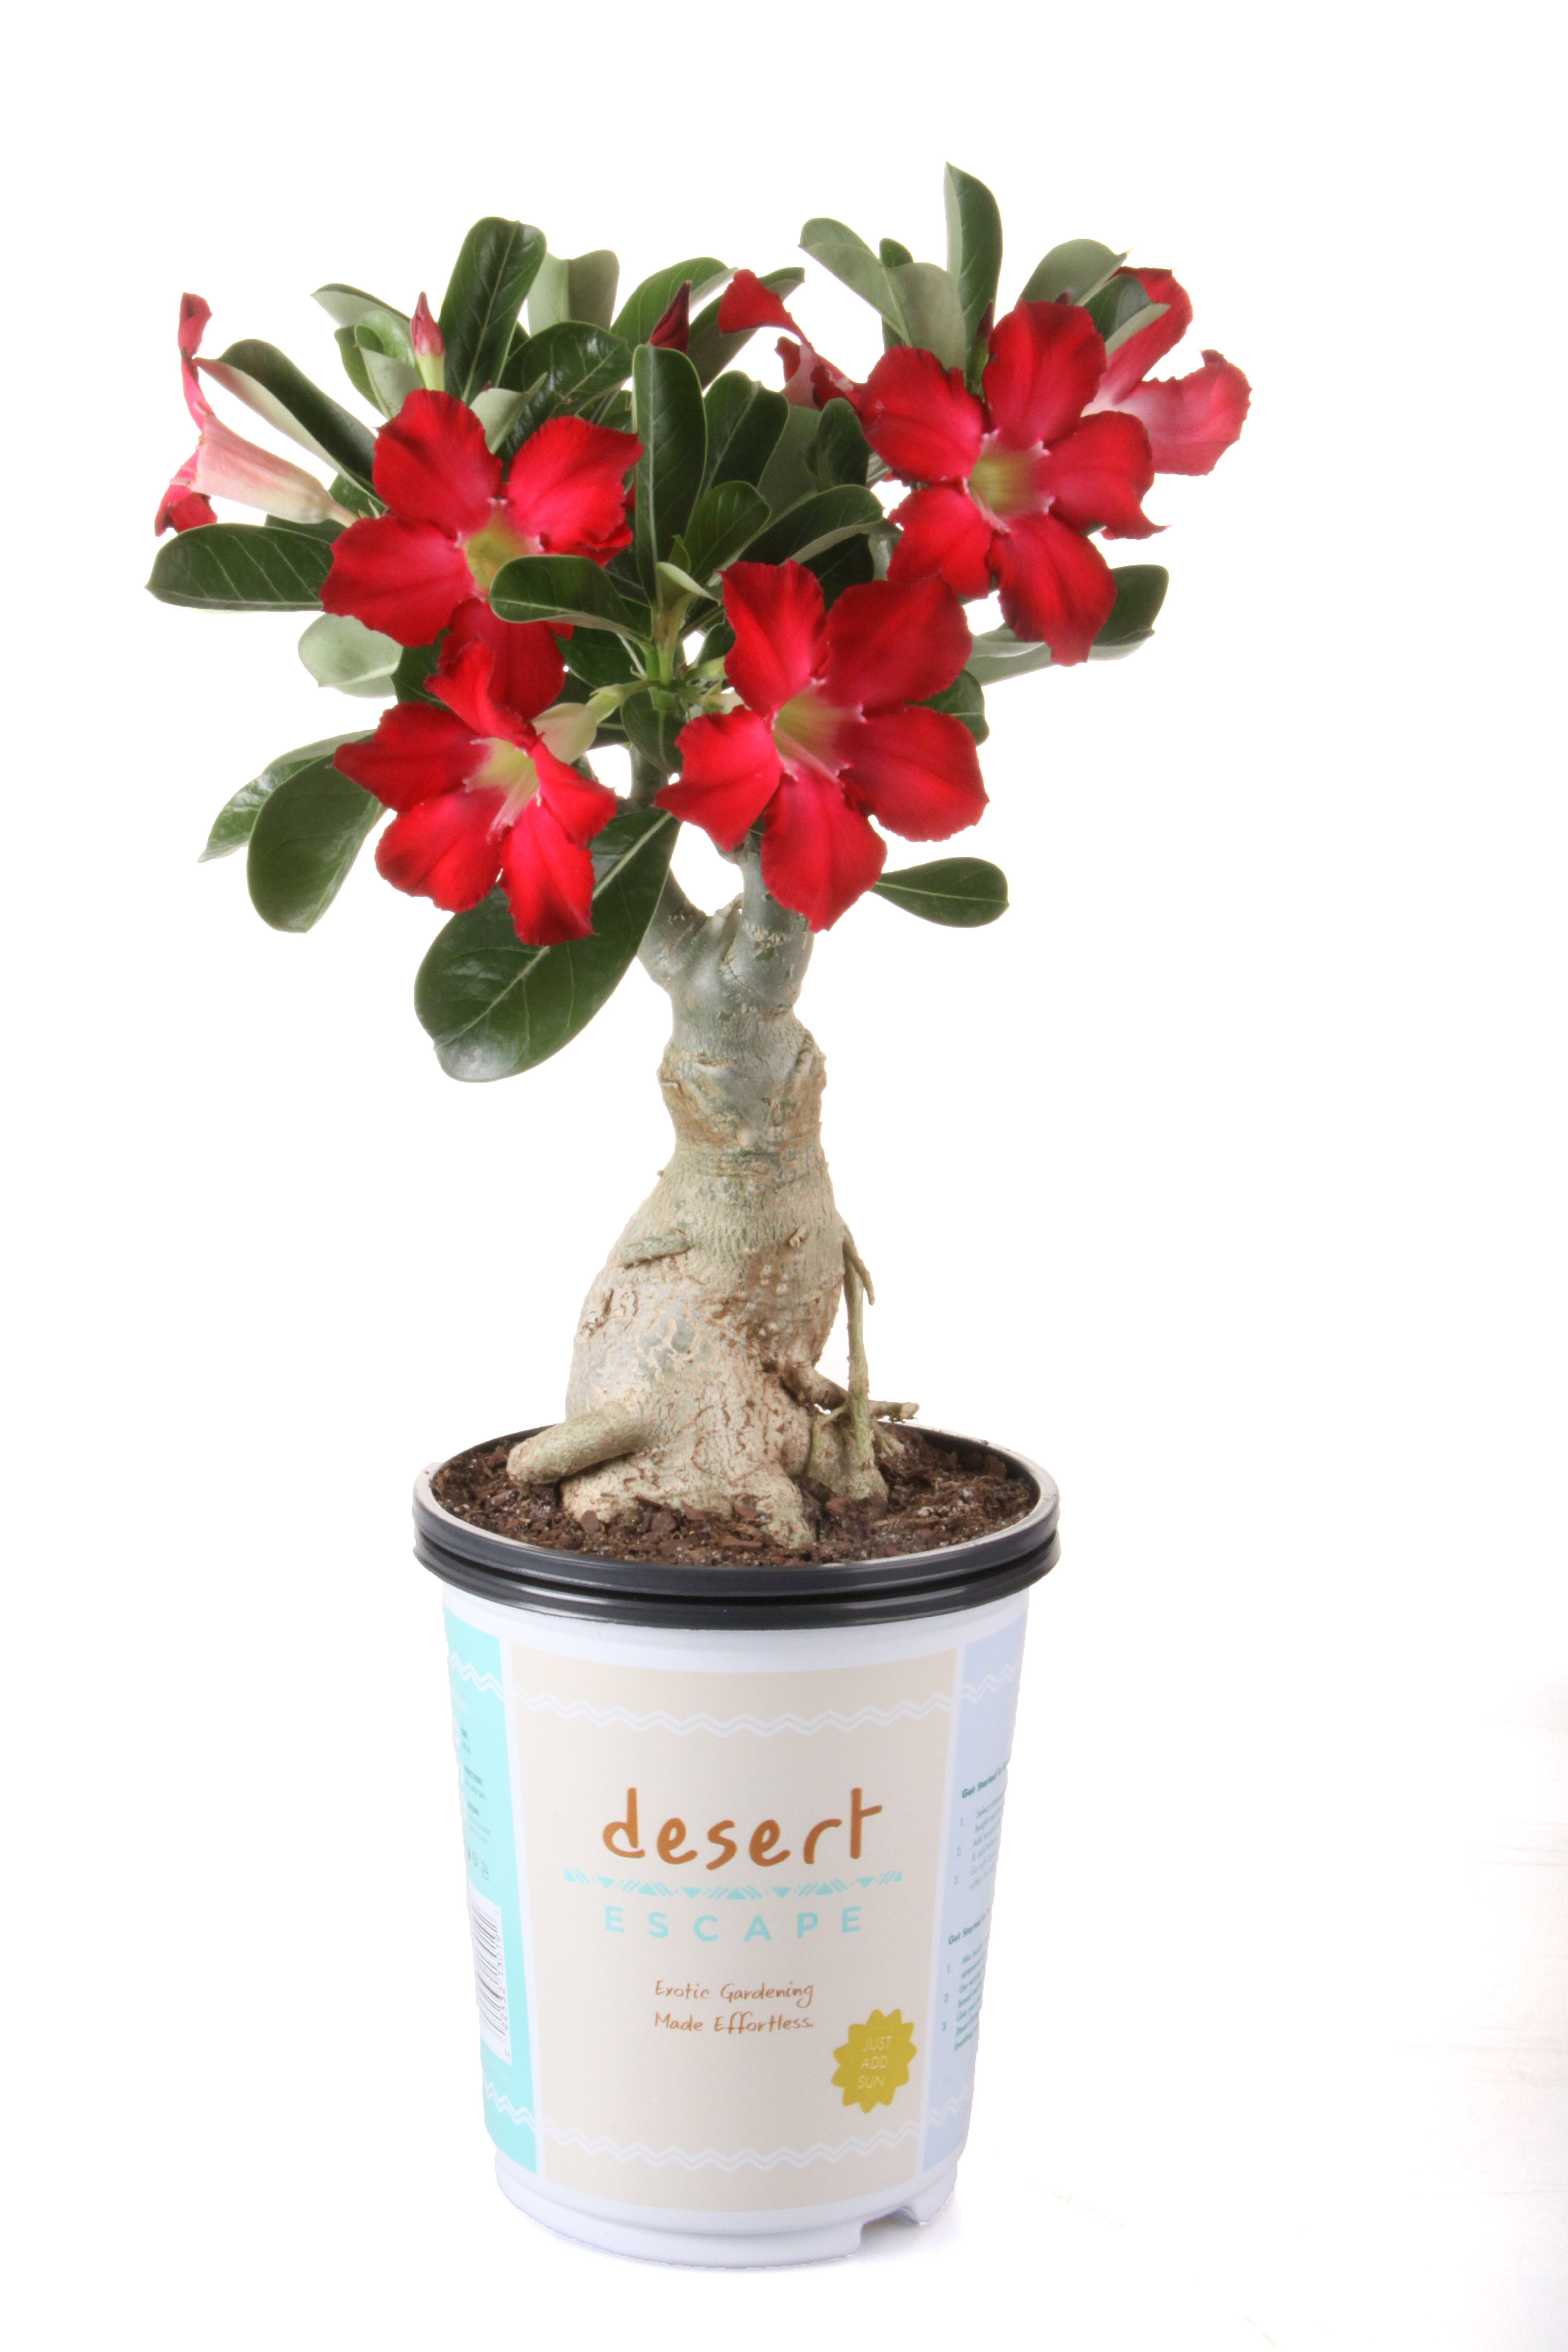 New Desert Escape Plant Collection From Costa Farms Creates Bold Modern Eco Friendly Designs